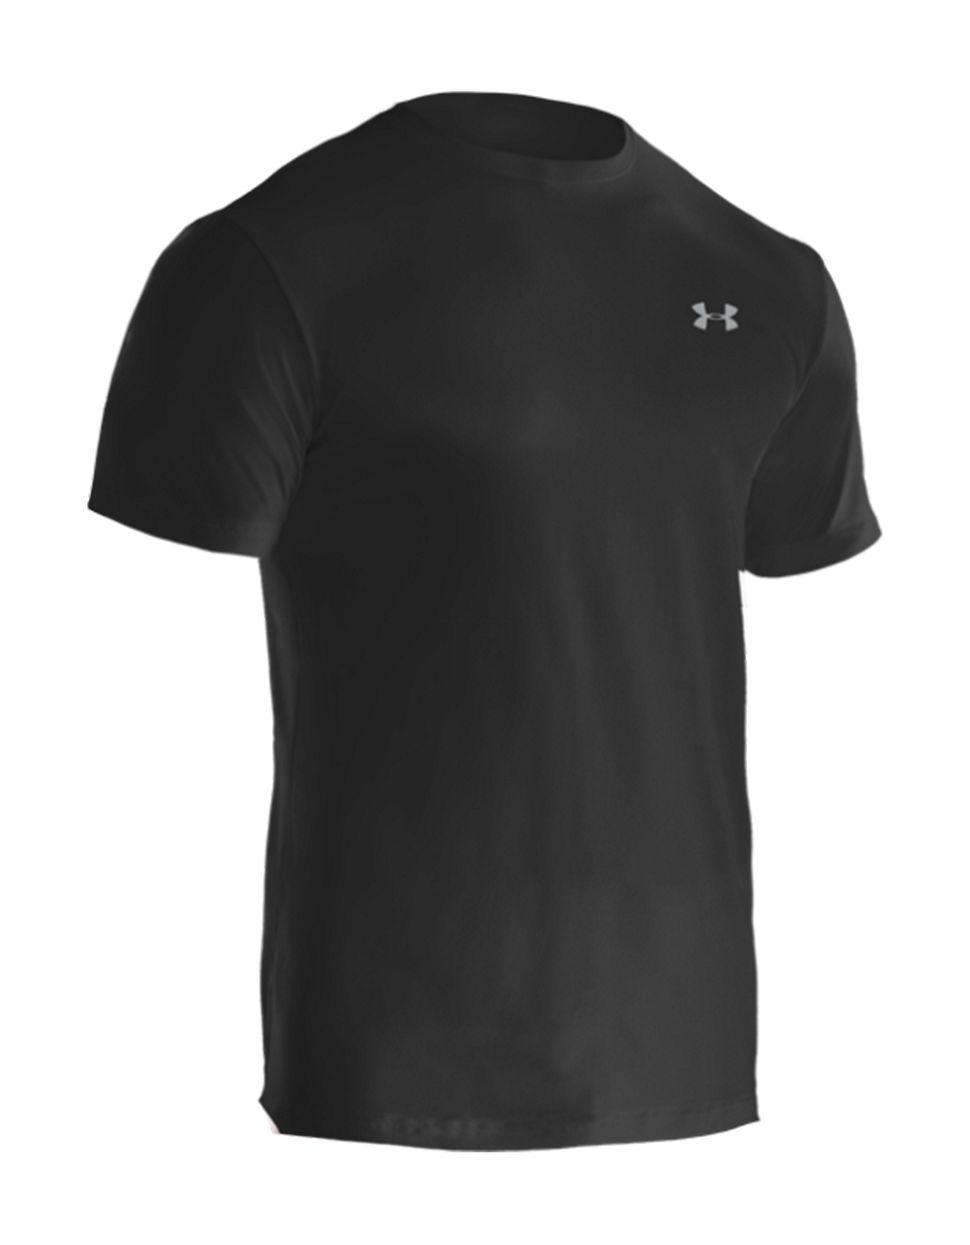 Under armour 2 pack heatgear undershirt in black for men for Mens under armour under shirt